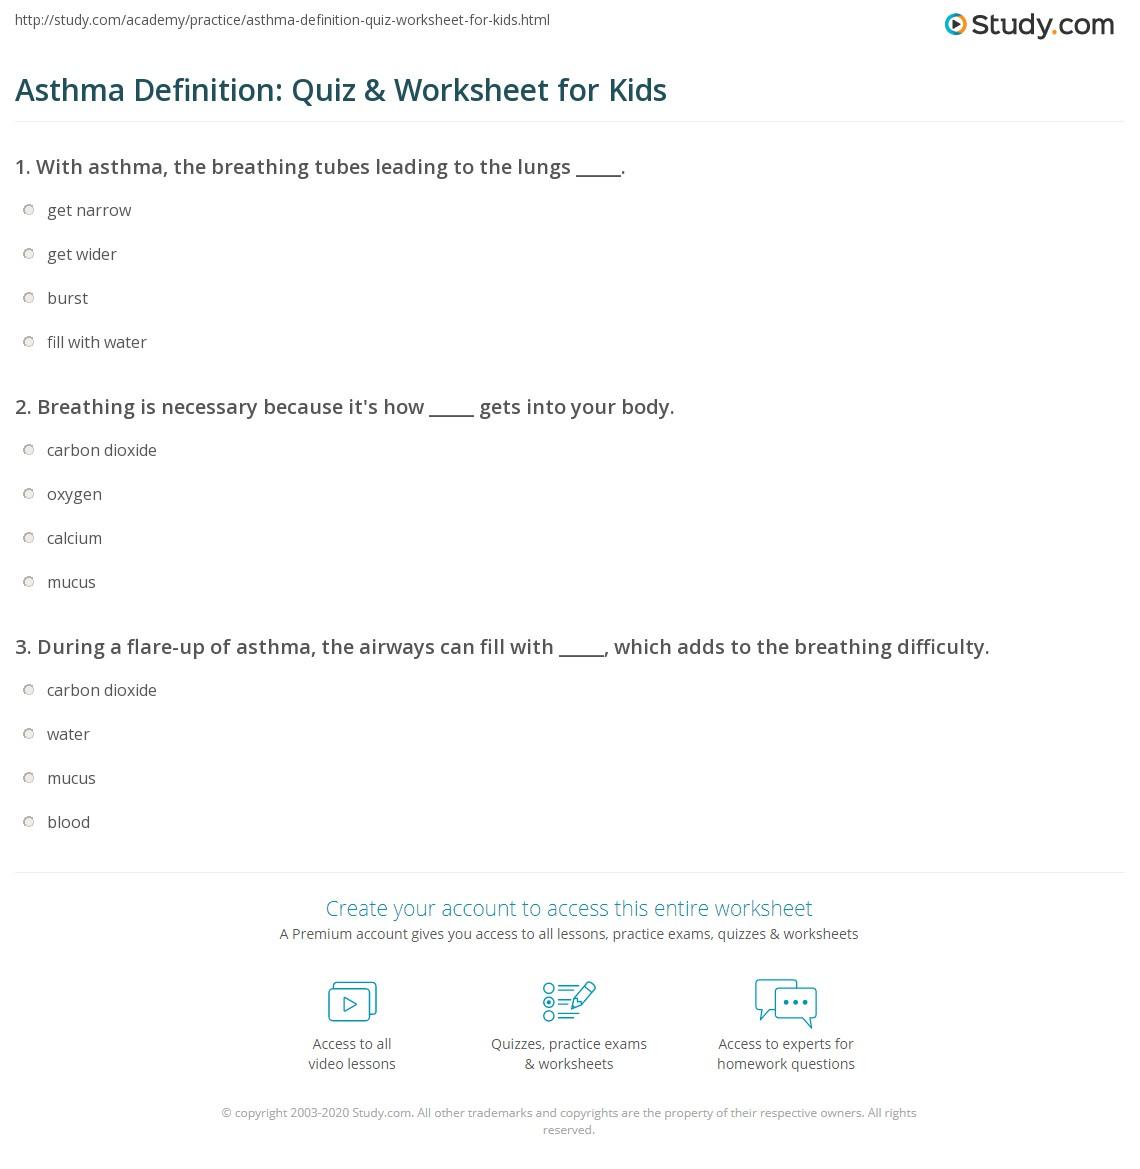 Asthma Definition Quiz Amp Worksheet For Kids